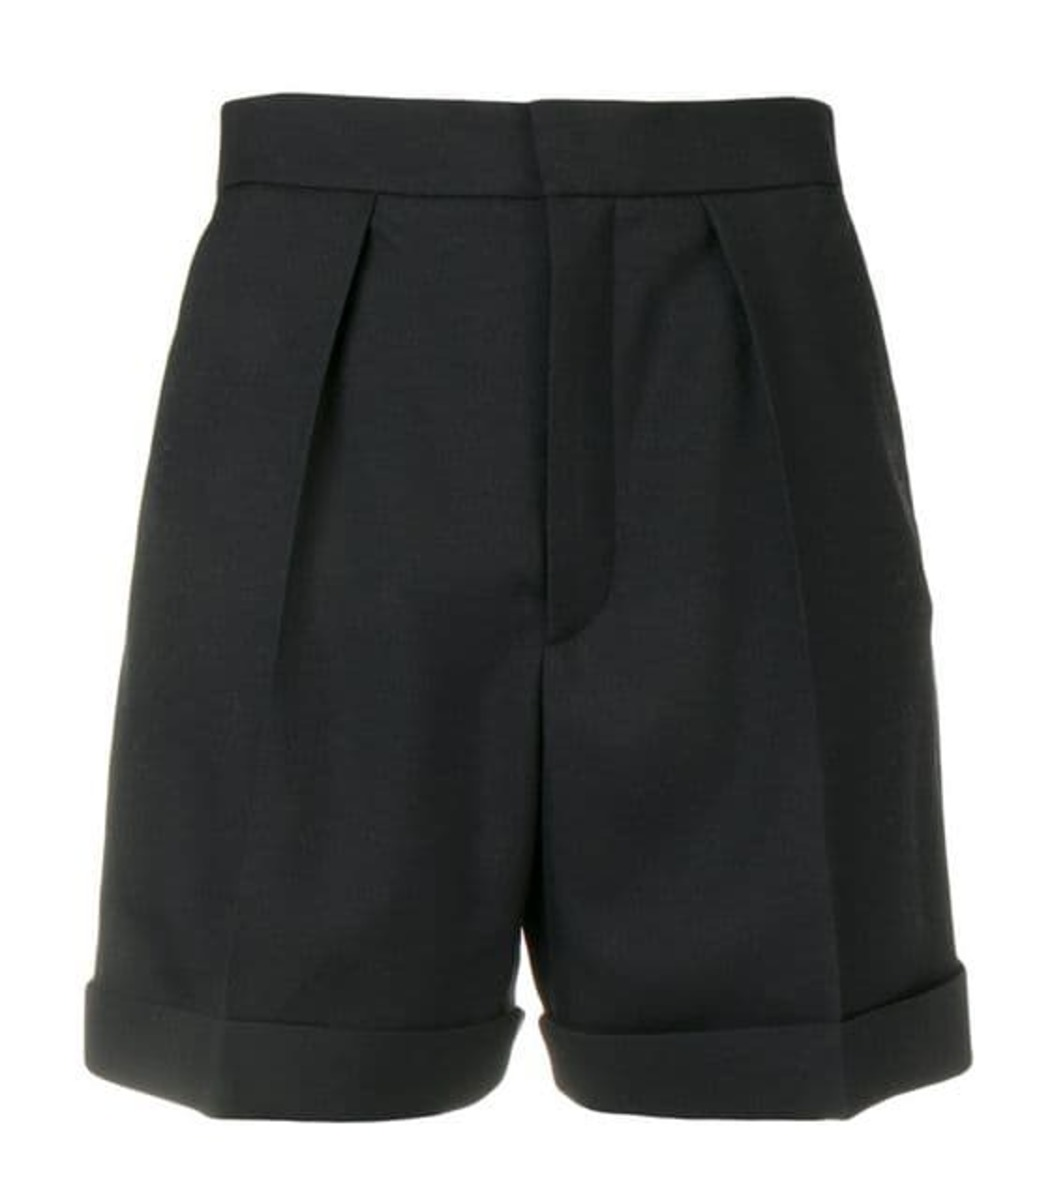 6833b89cc9747 Women's Shorts - Shop Worldwide Fashion - SeekFab